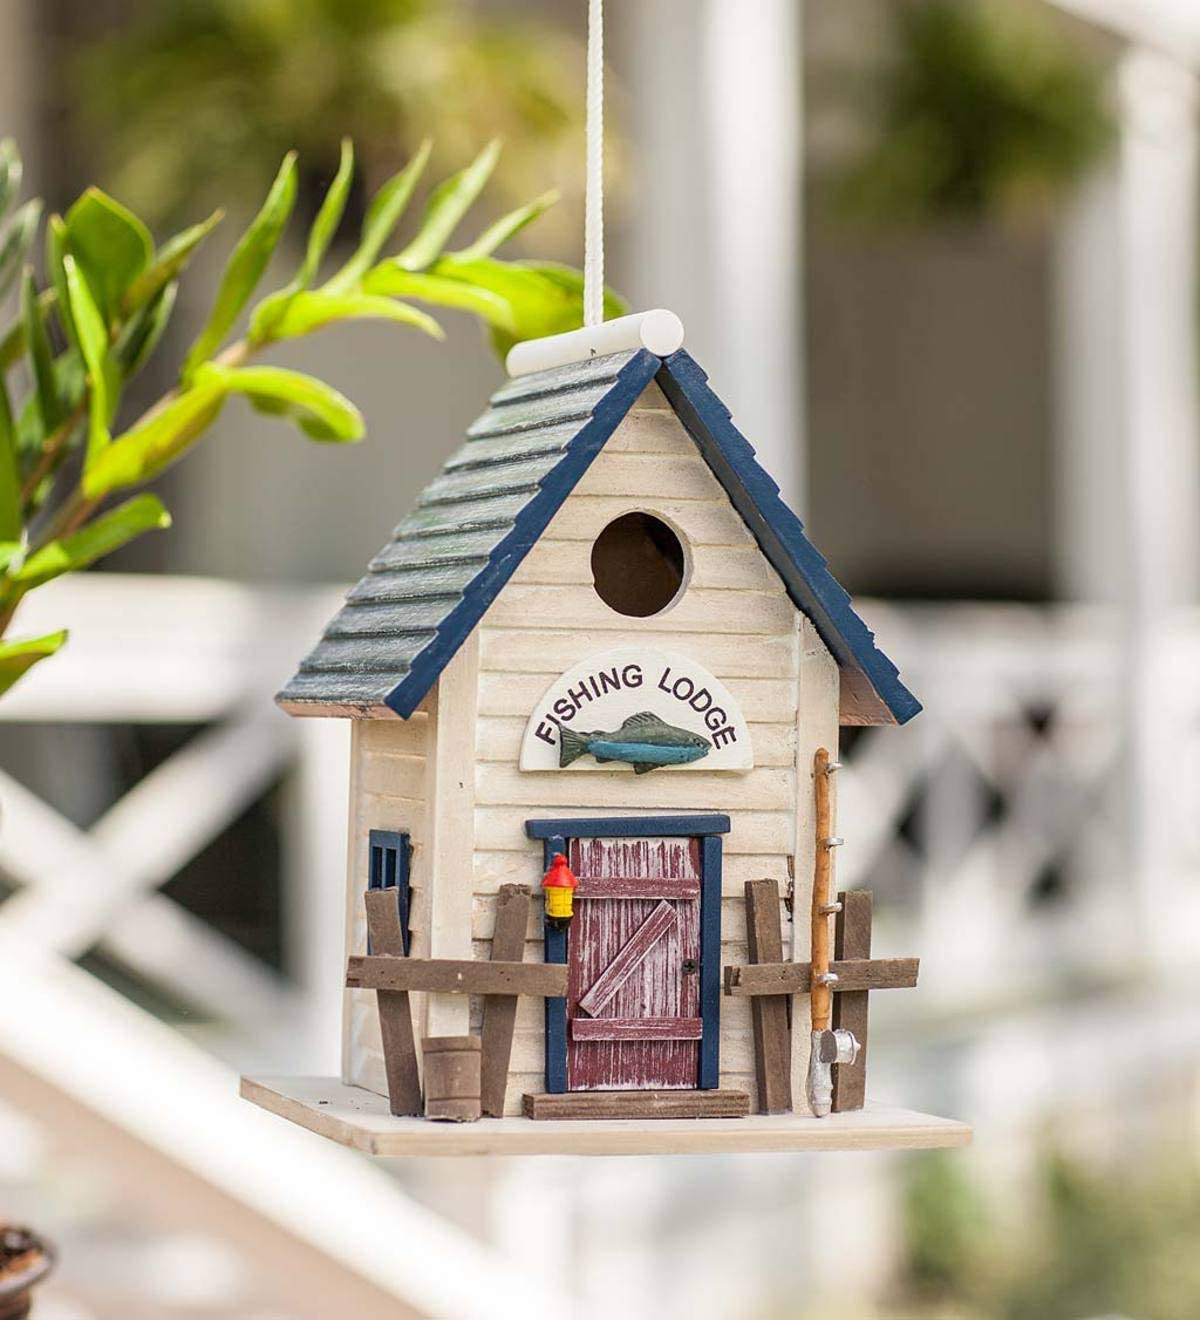 Home Bazaar HB-6022S Fishing Lodge Birdhouse, Multi